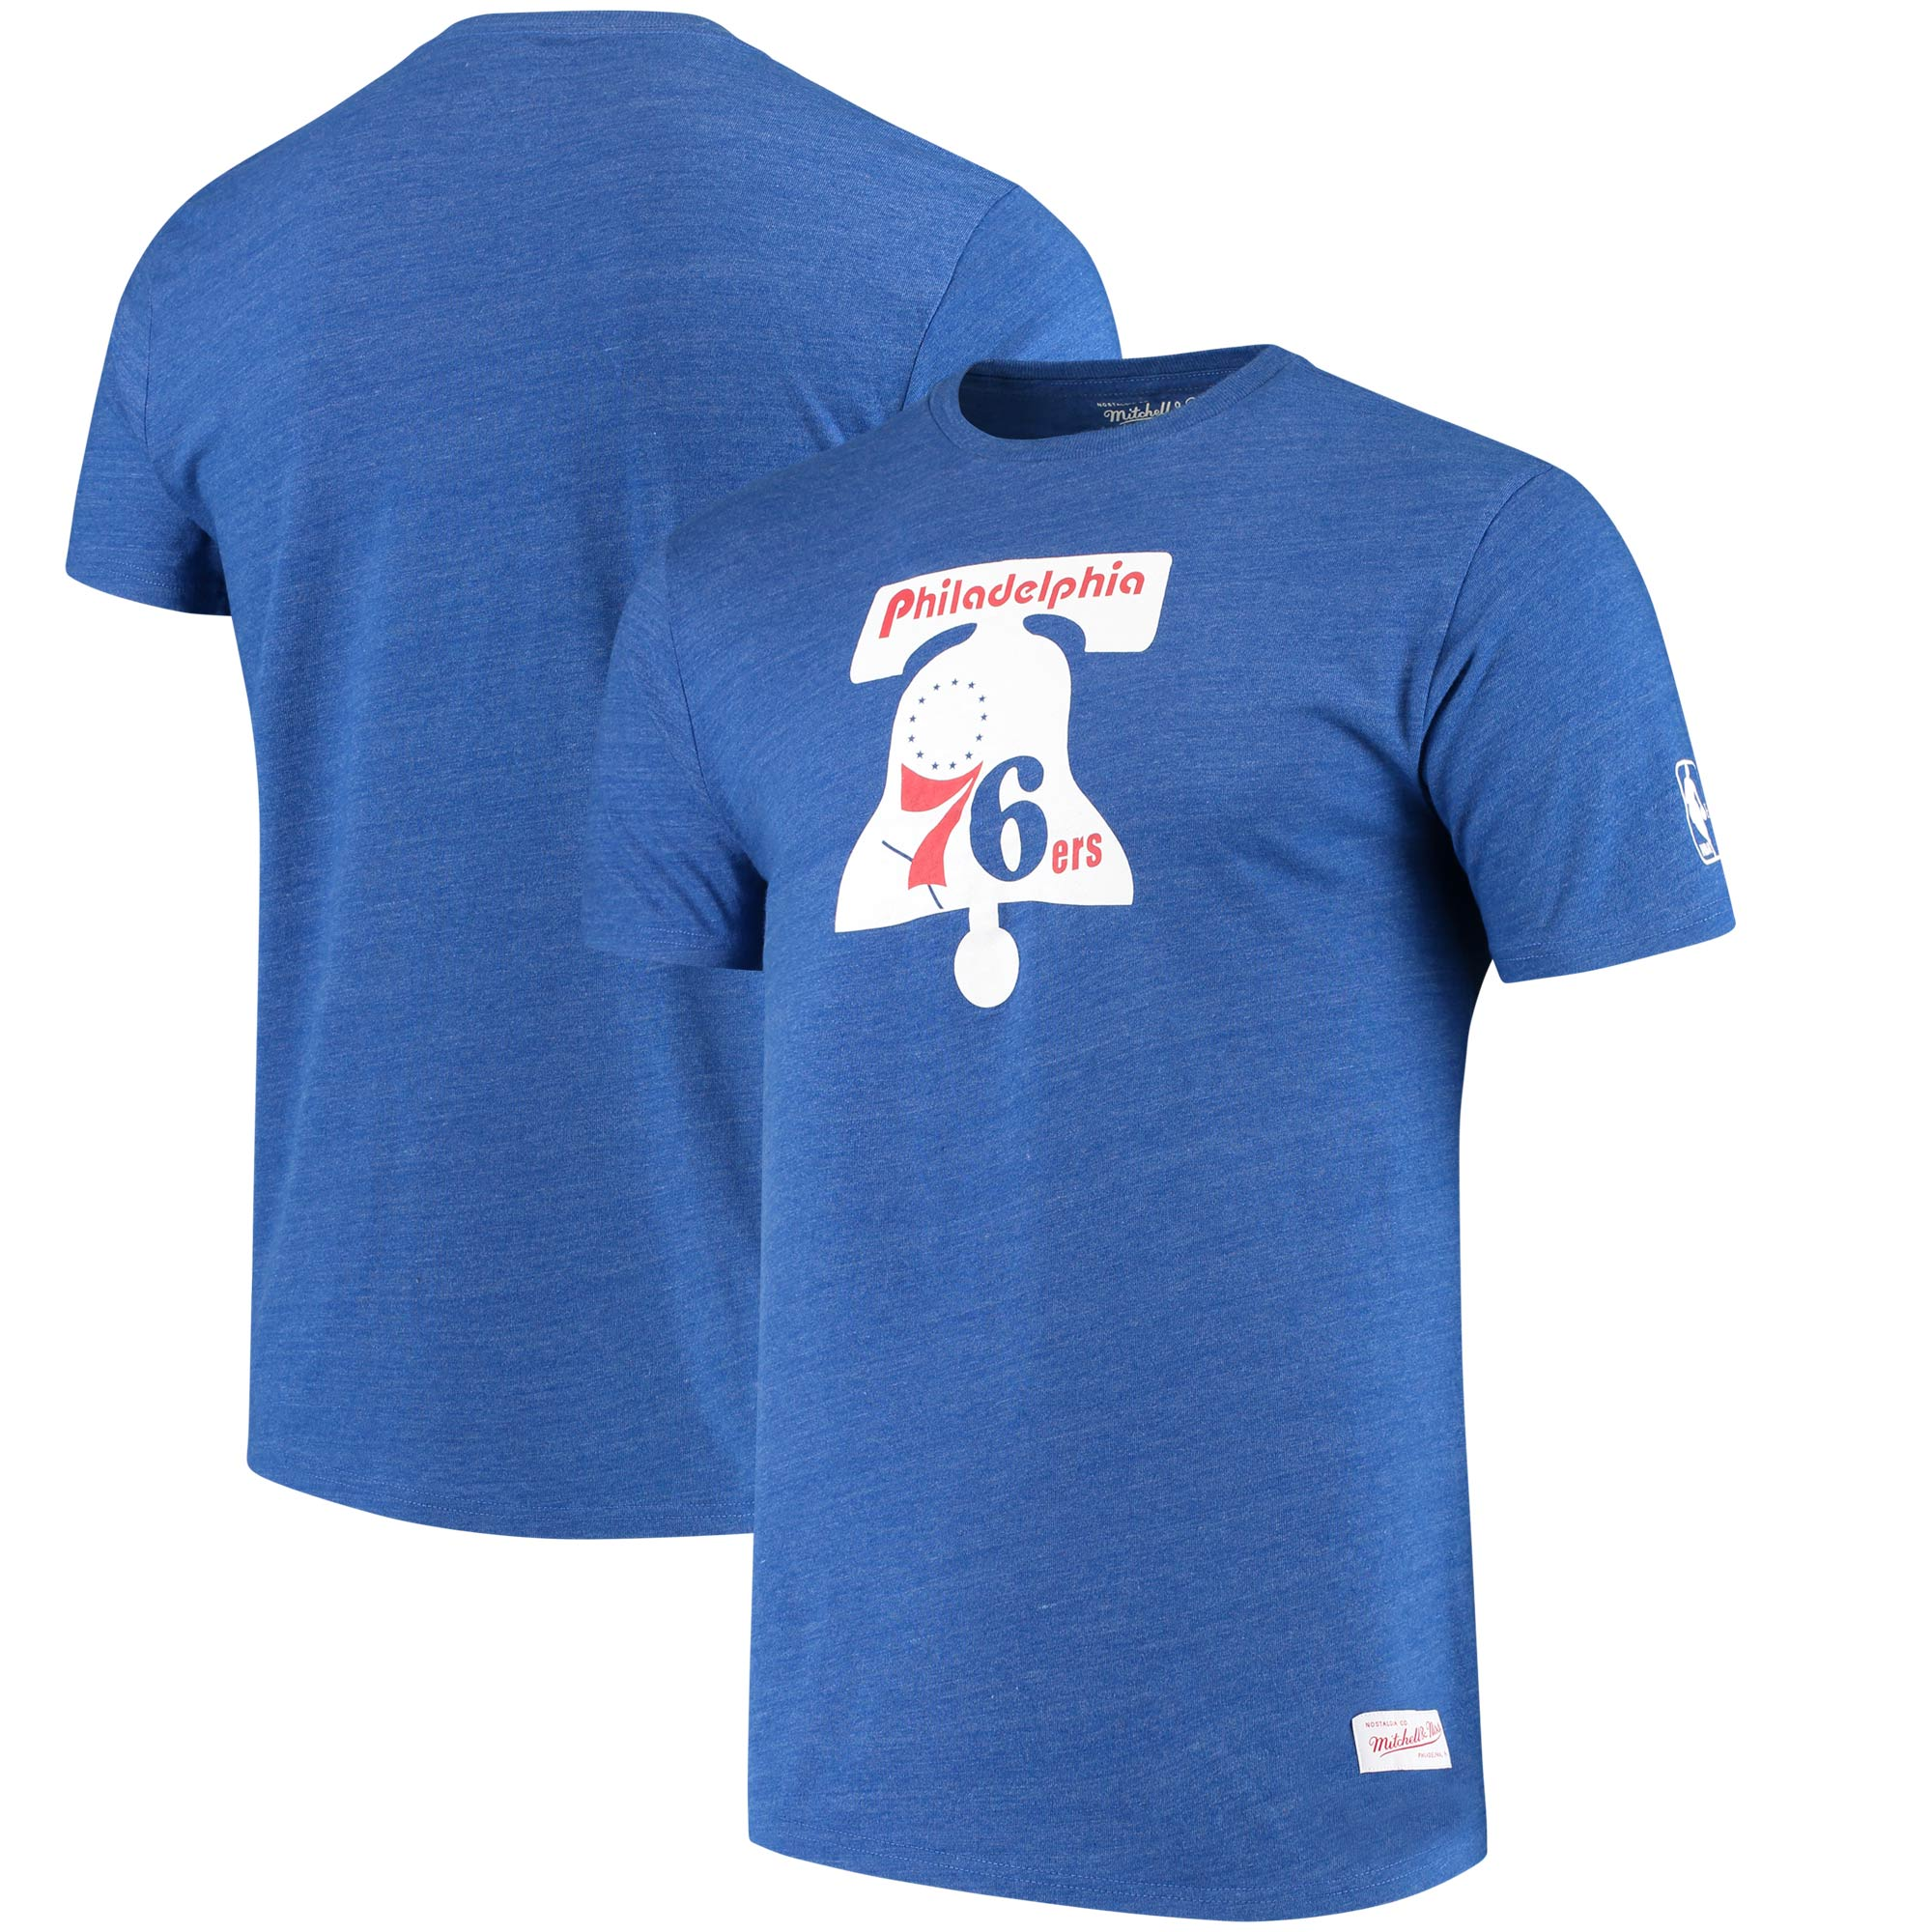 Philadelphia 76ers Mitchell & Ness Hardwood Classics Throwback Logo Tri-Blend T-Shirt - Heathered Royal